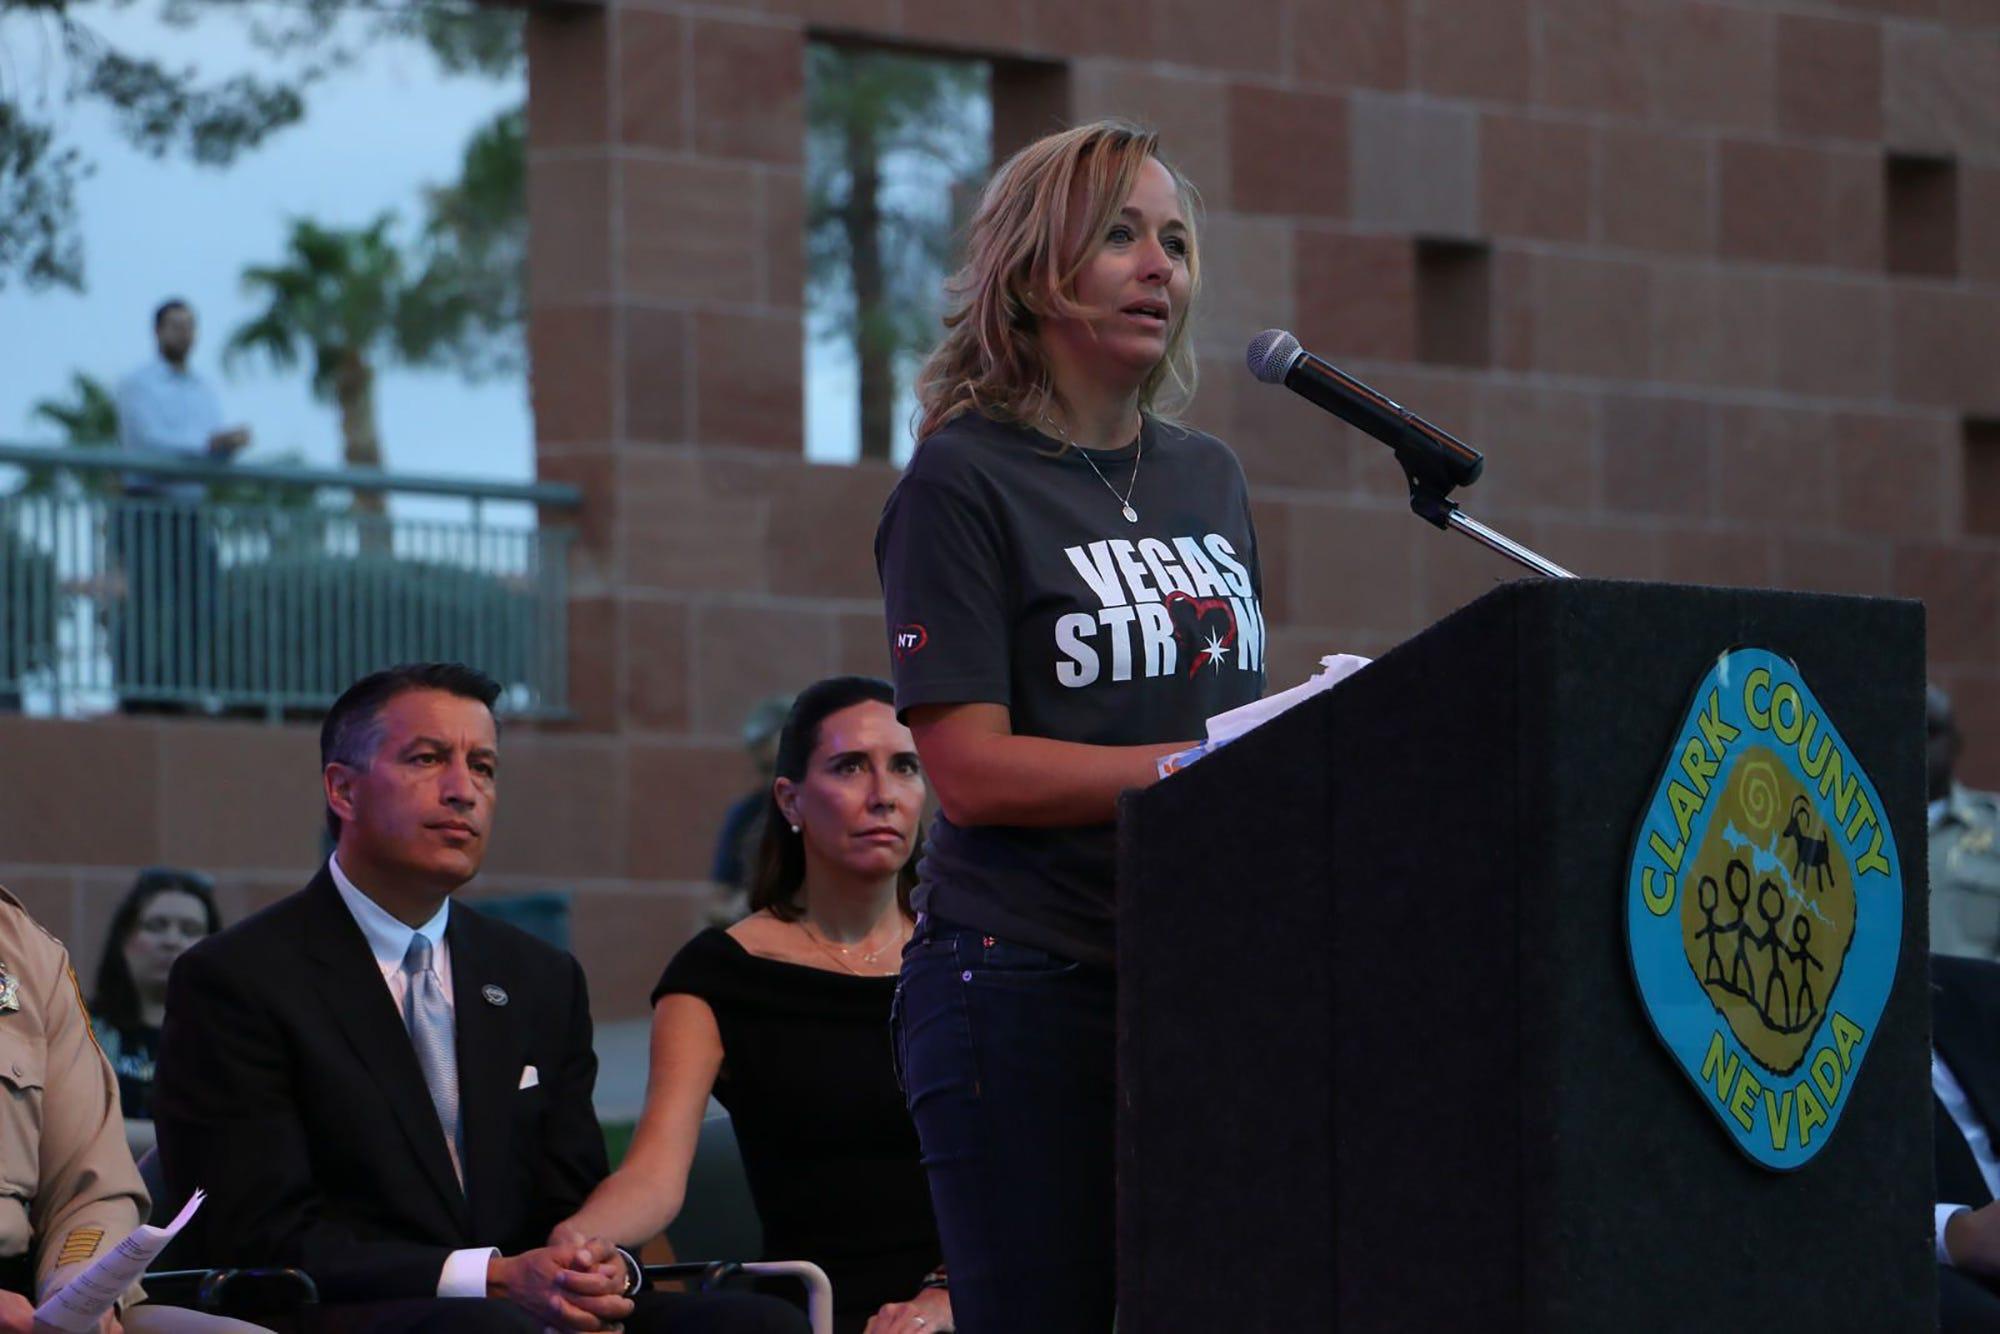 On Las Vegas shooting anniversary, a call for hope amid sadness